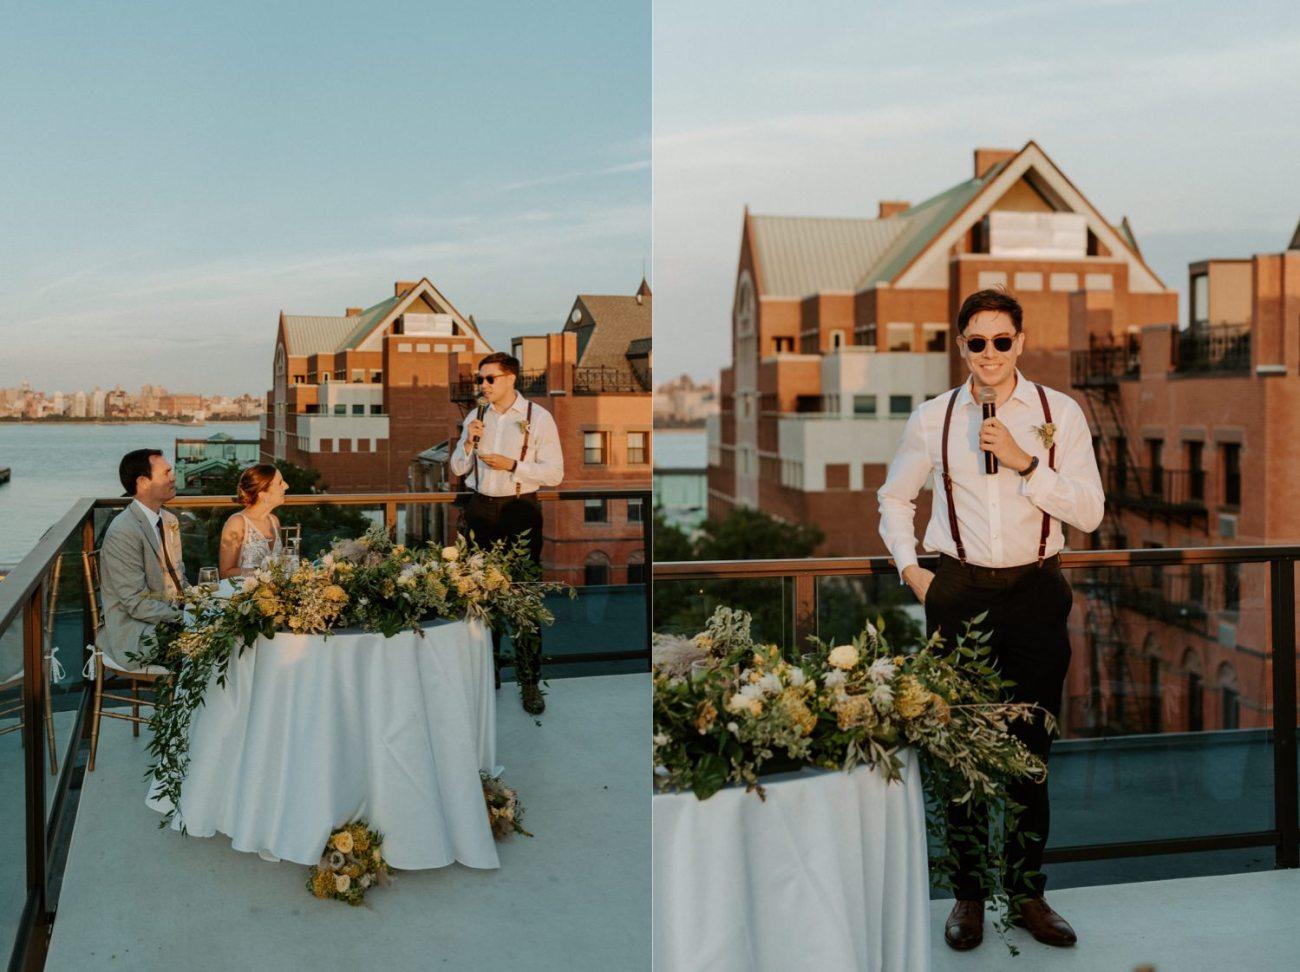 Antique Loft Hoboken Wedding New Jersey Wedding Photographer Anais Possamai Photography 091